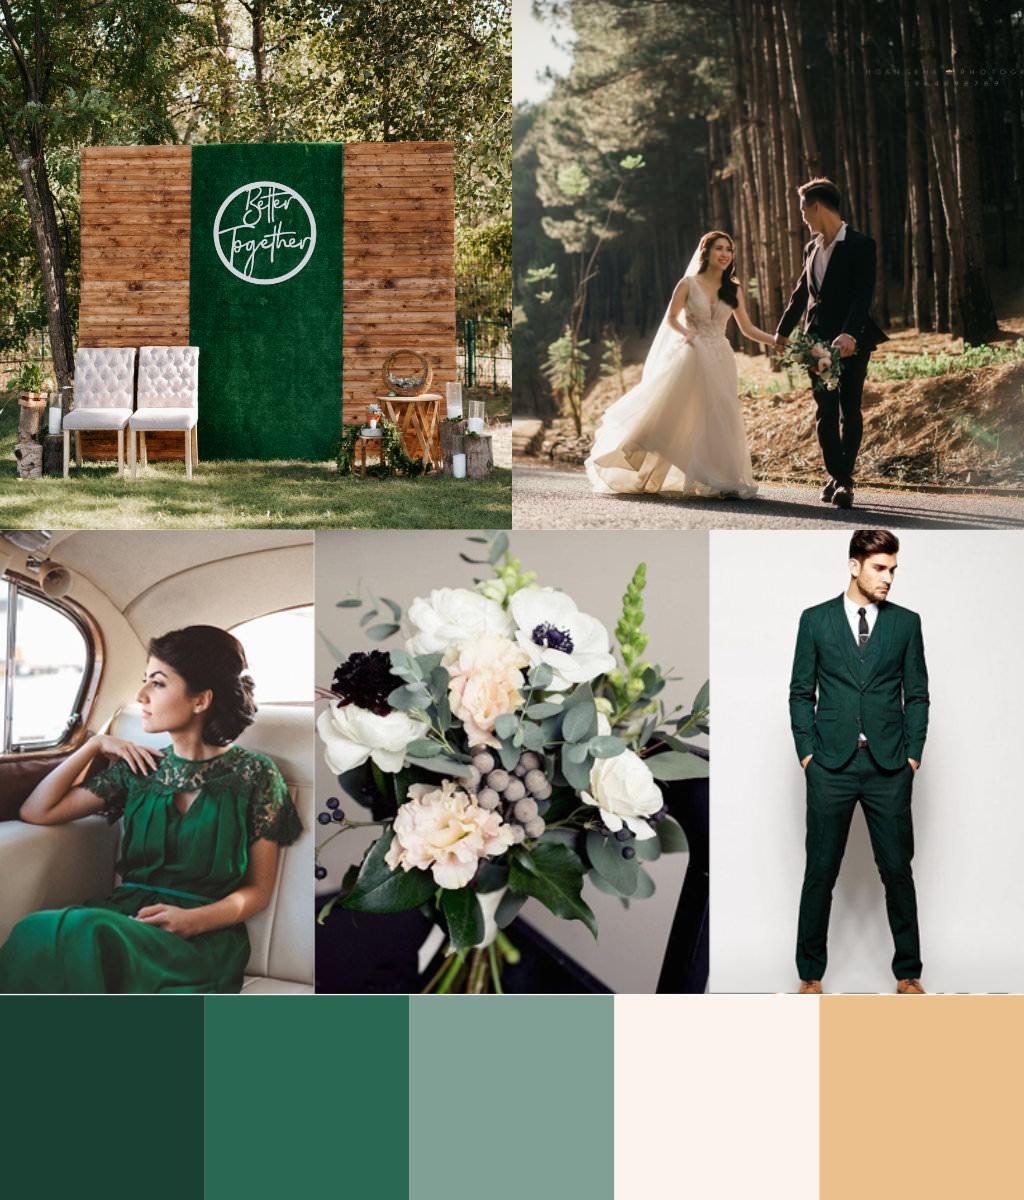 Forest Green Design palette